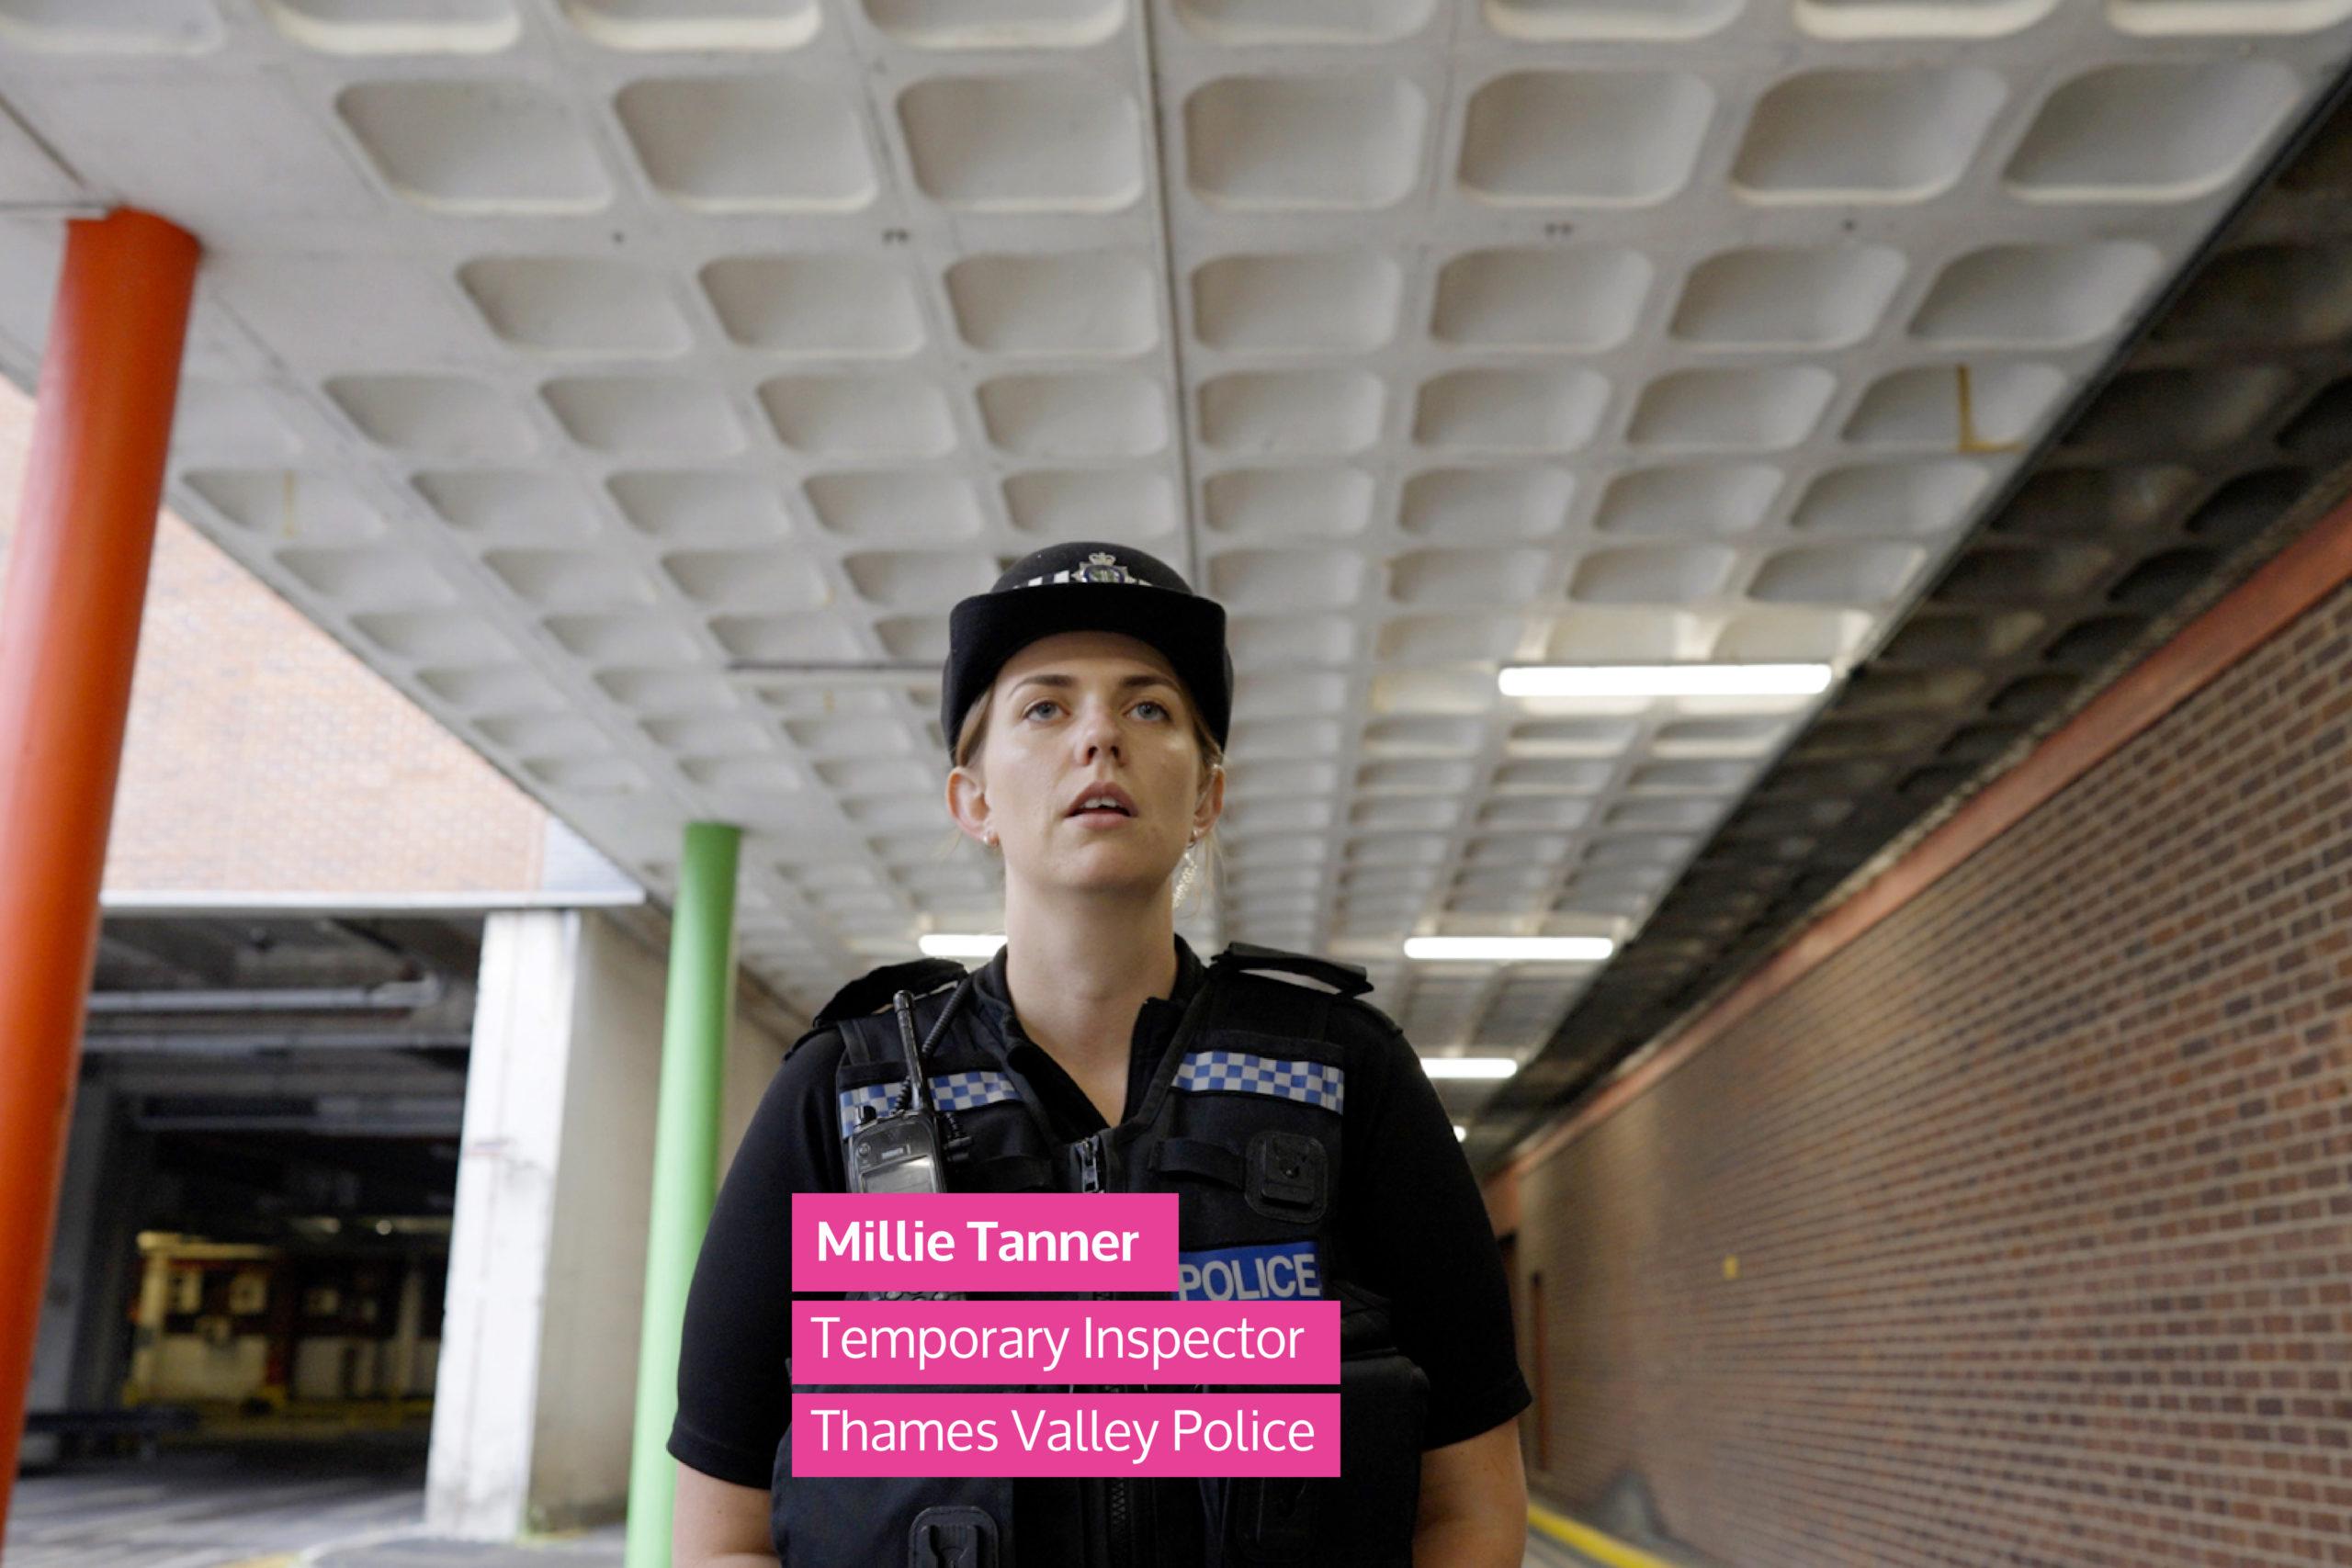 Millie Tanner | Temporary Inspector